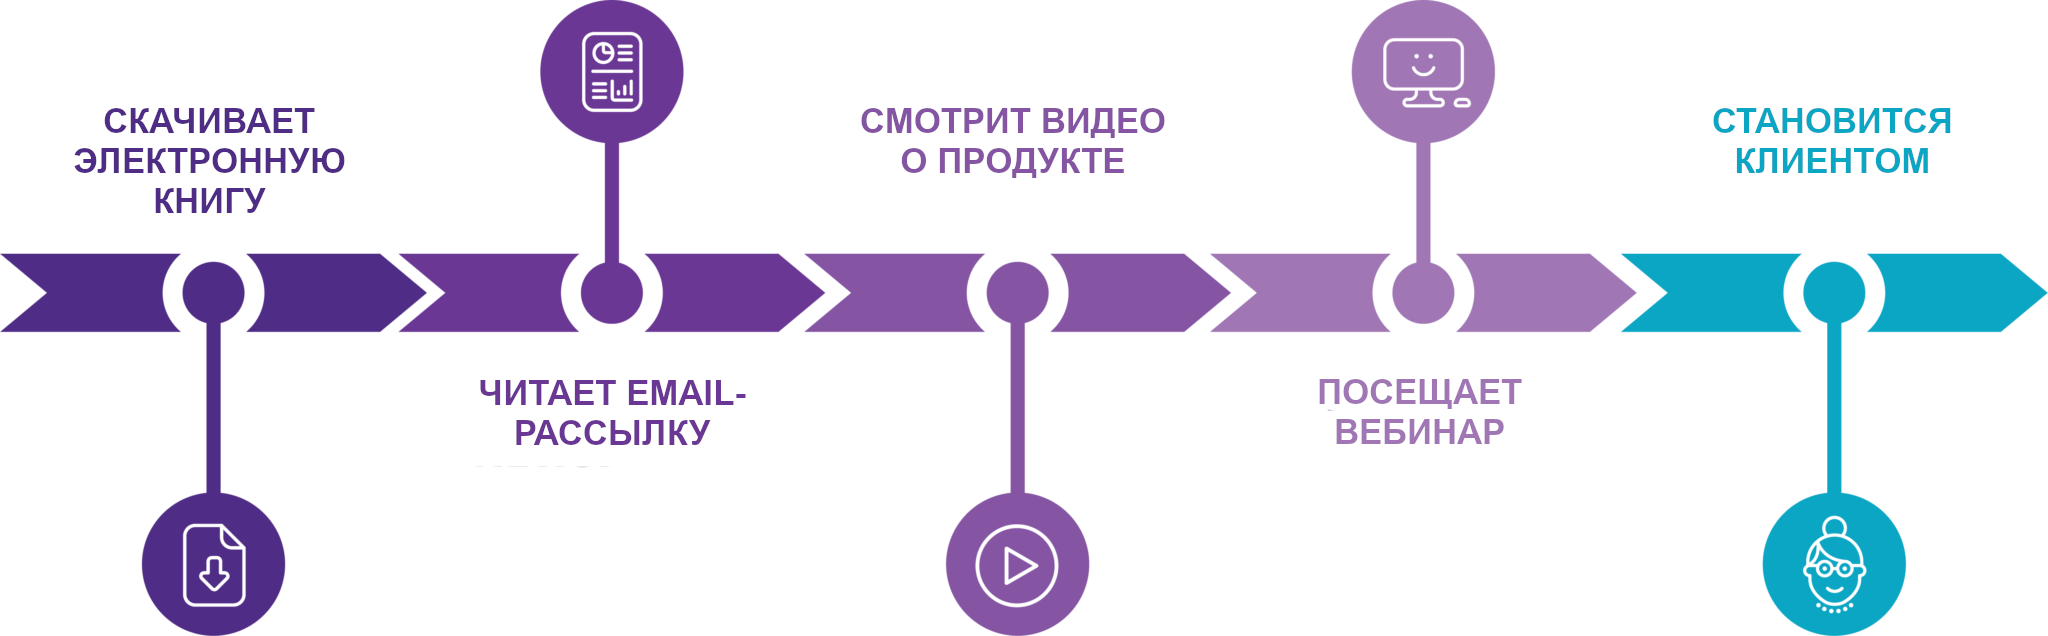 Модель multi-touch атрибуции